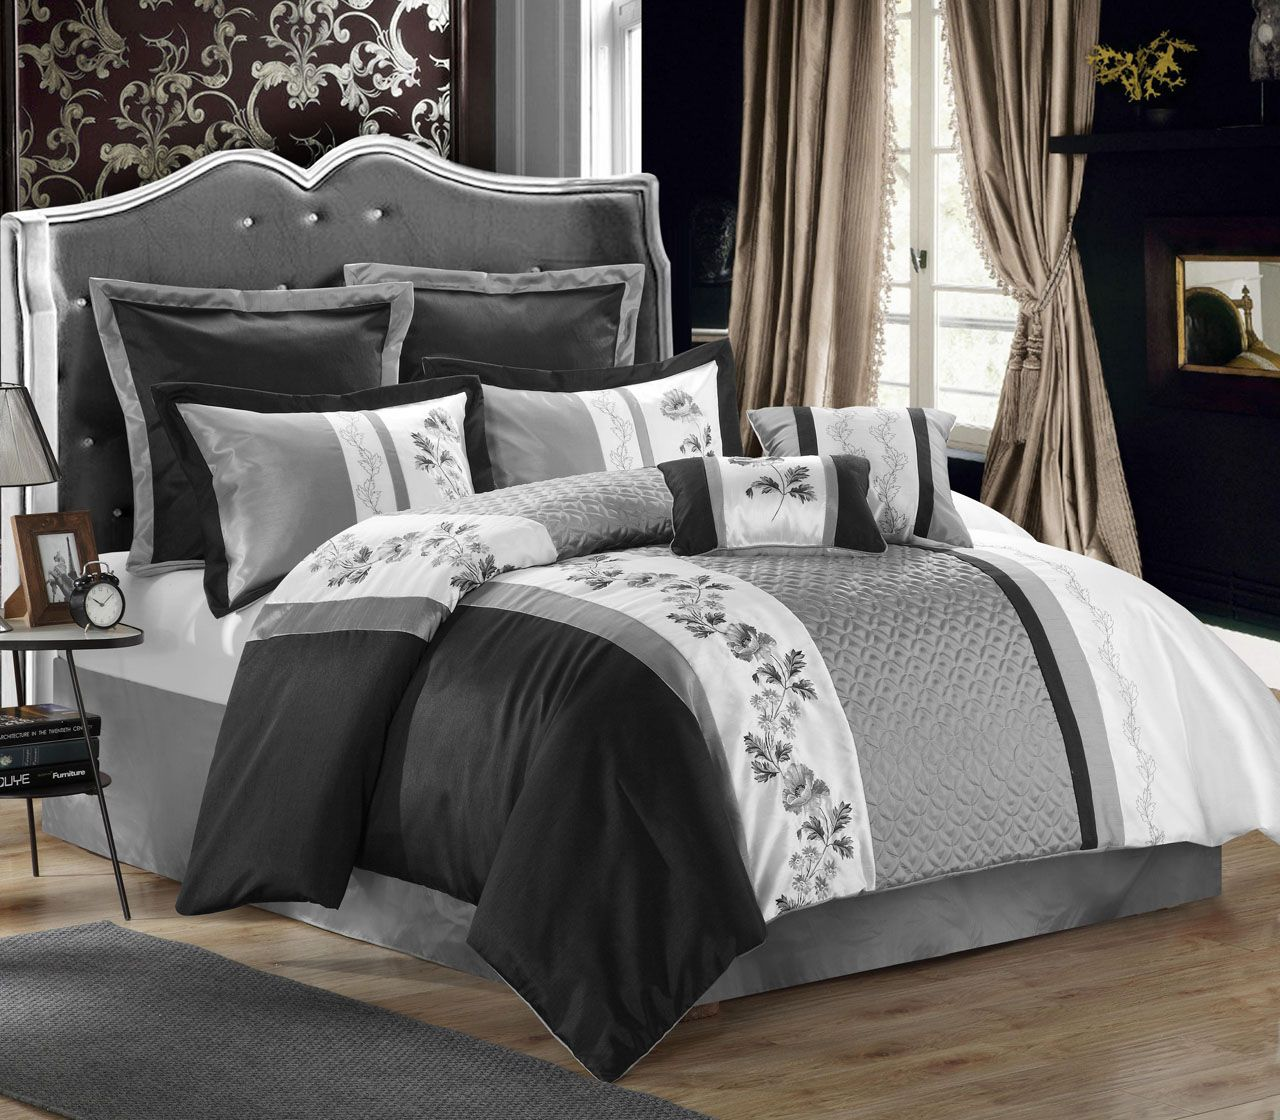 piece serbia blackgraywhite comforter set  bedroom ideas  -  piece serbia blackgraywhite comforter set